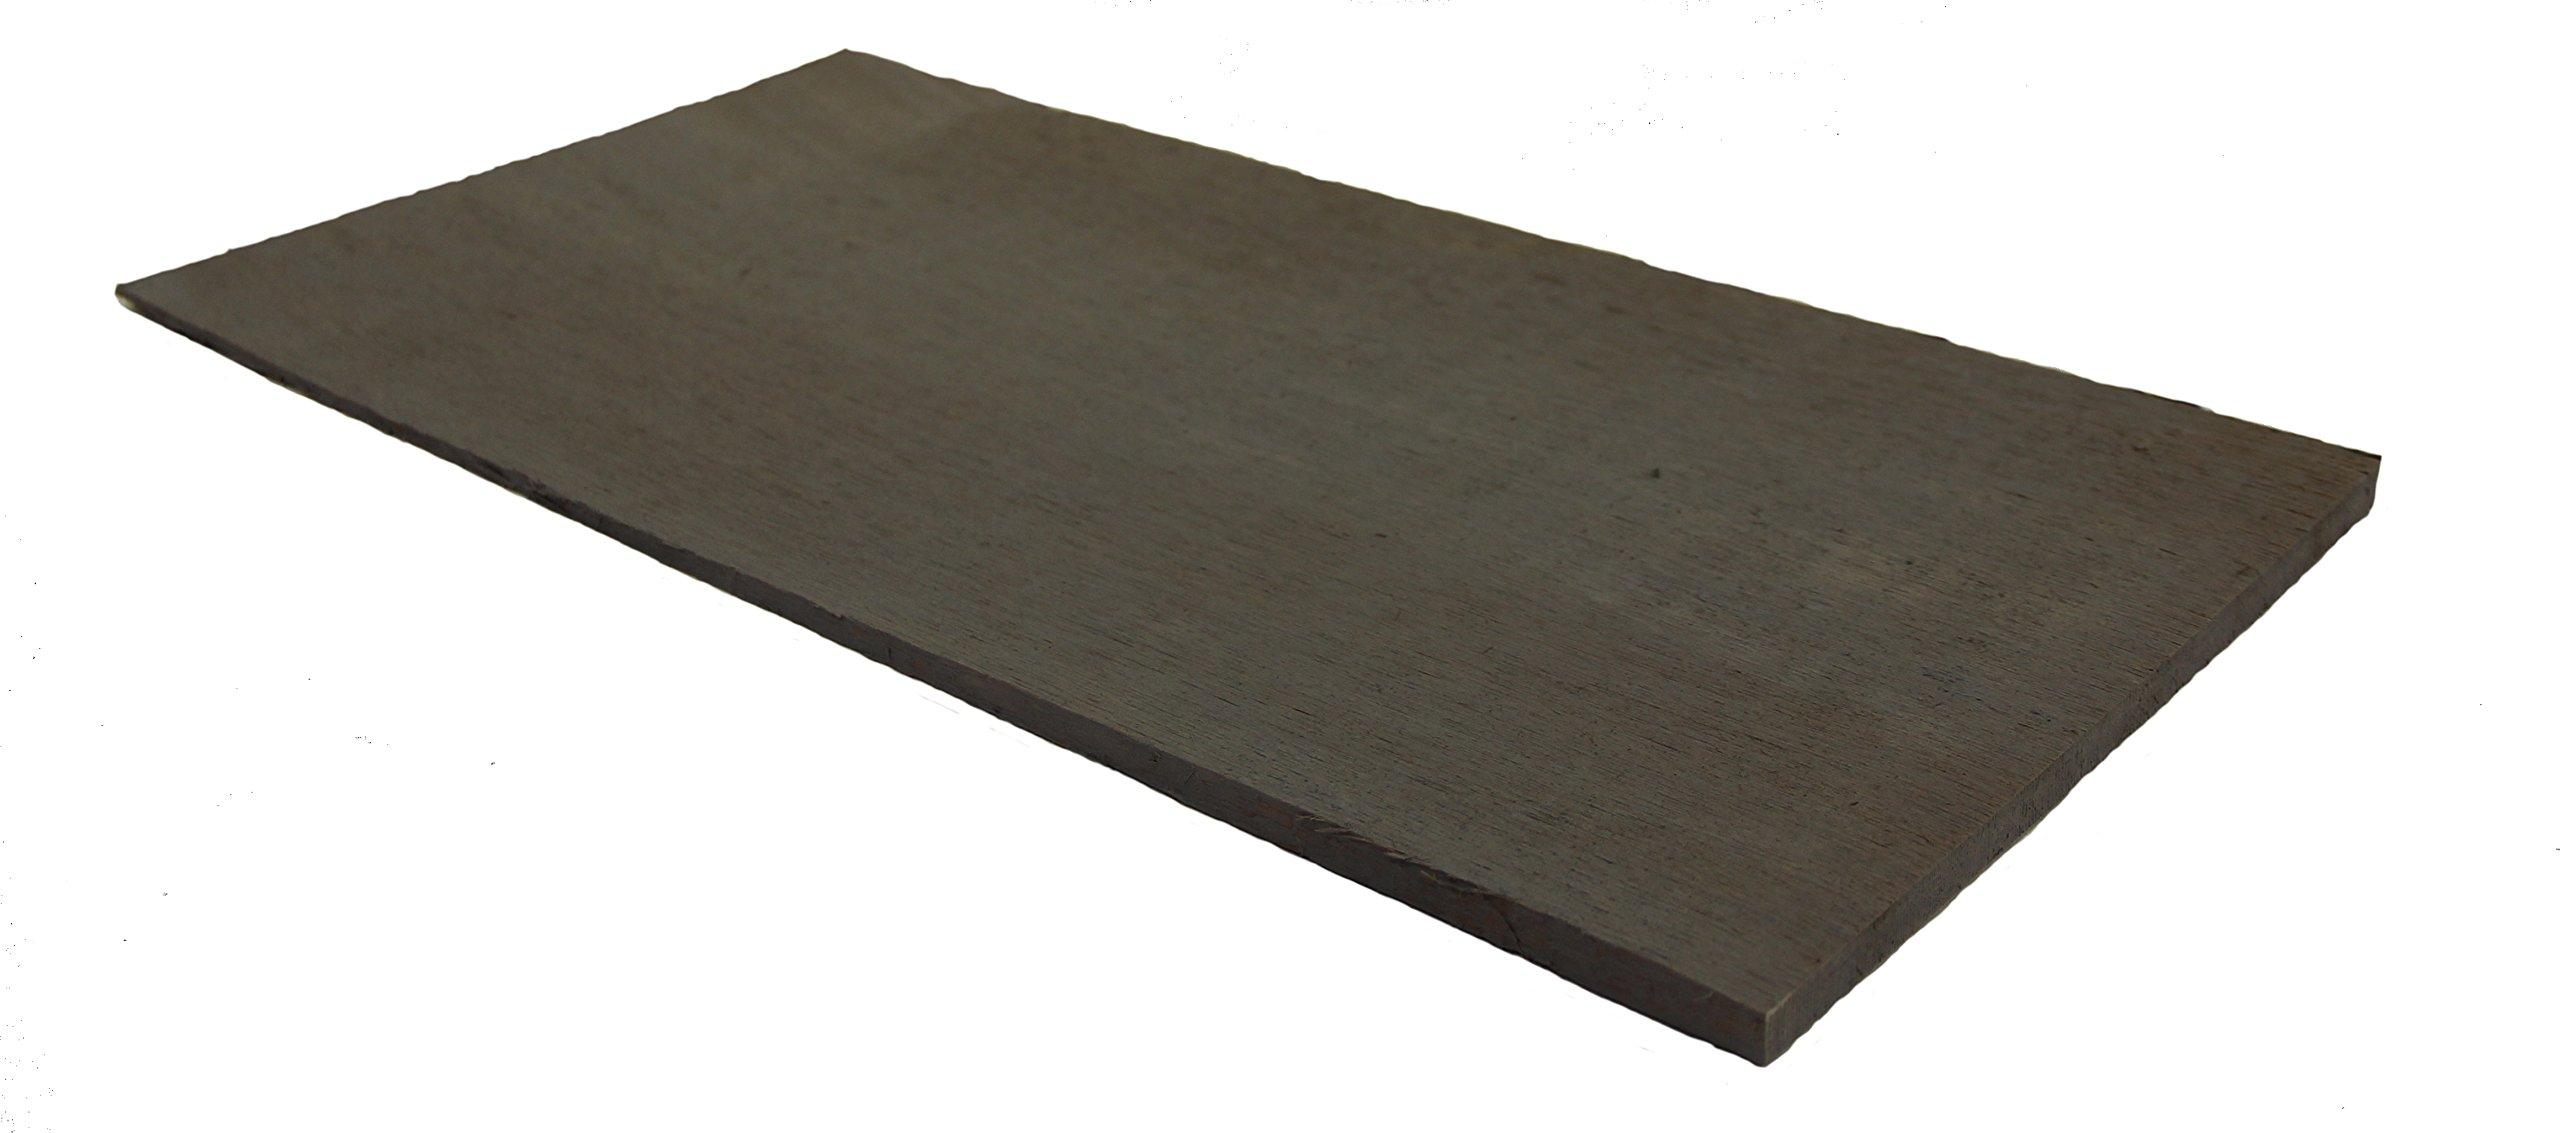 Western Red Cedar 18'' R&R Primed Gray Sanded Sidewall Shingles Full square cartons